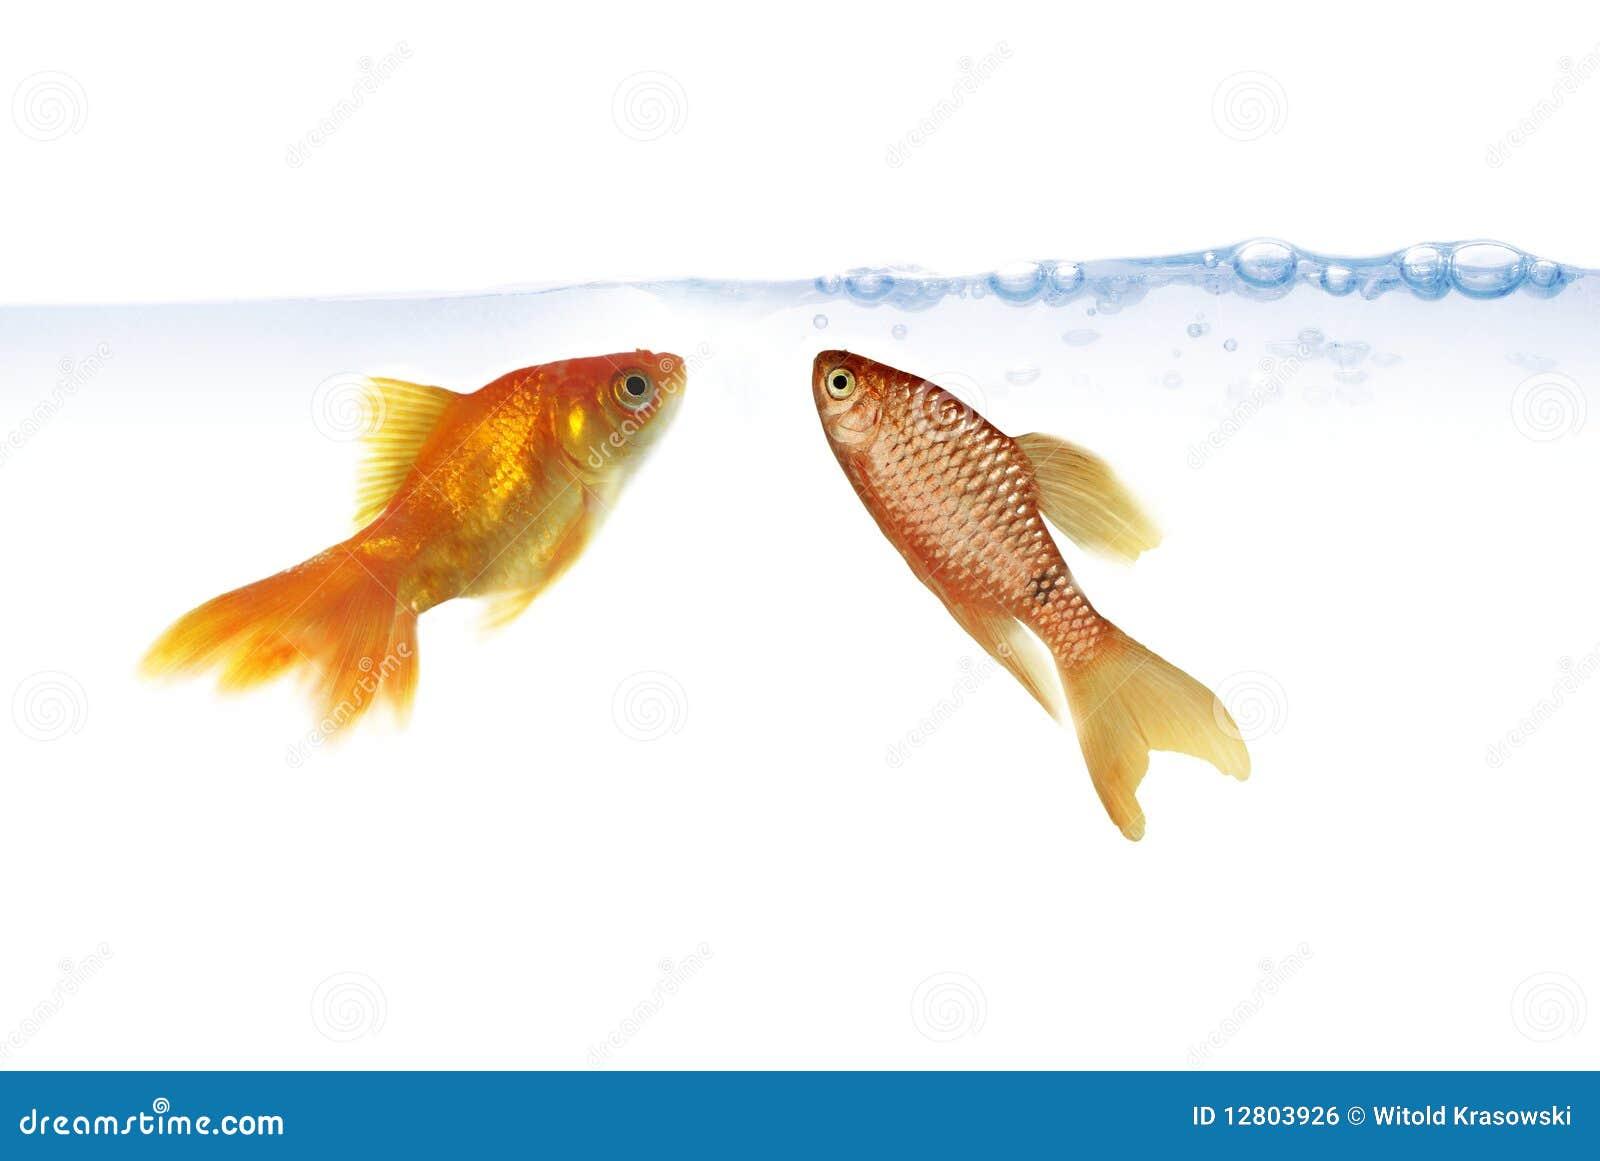 Dois peixes do ouro